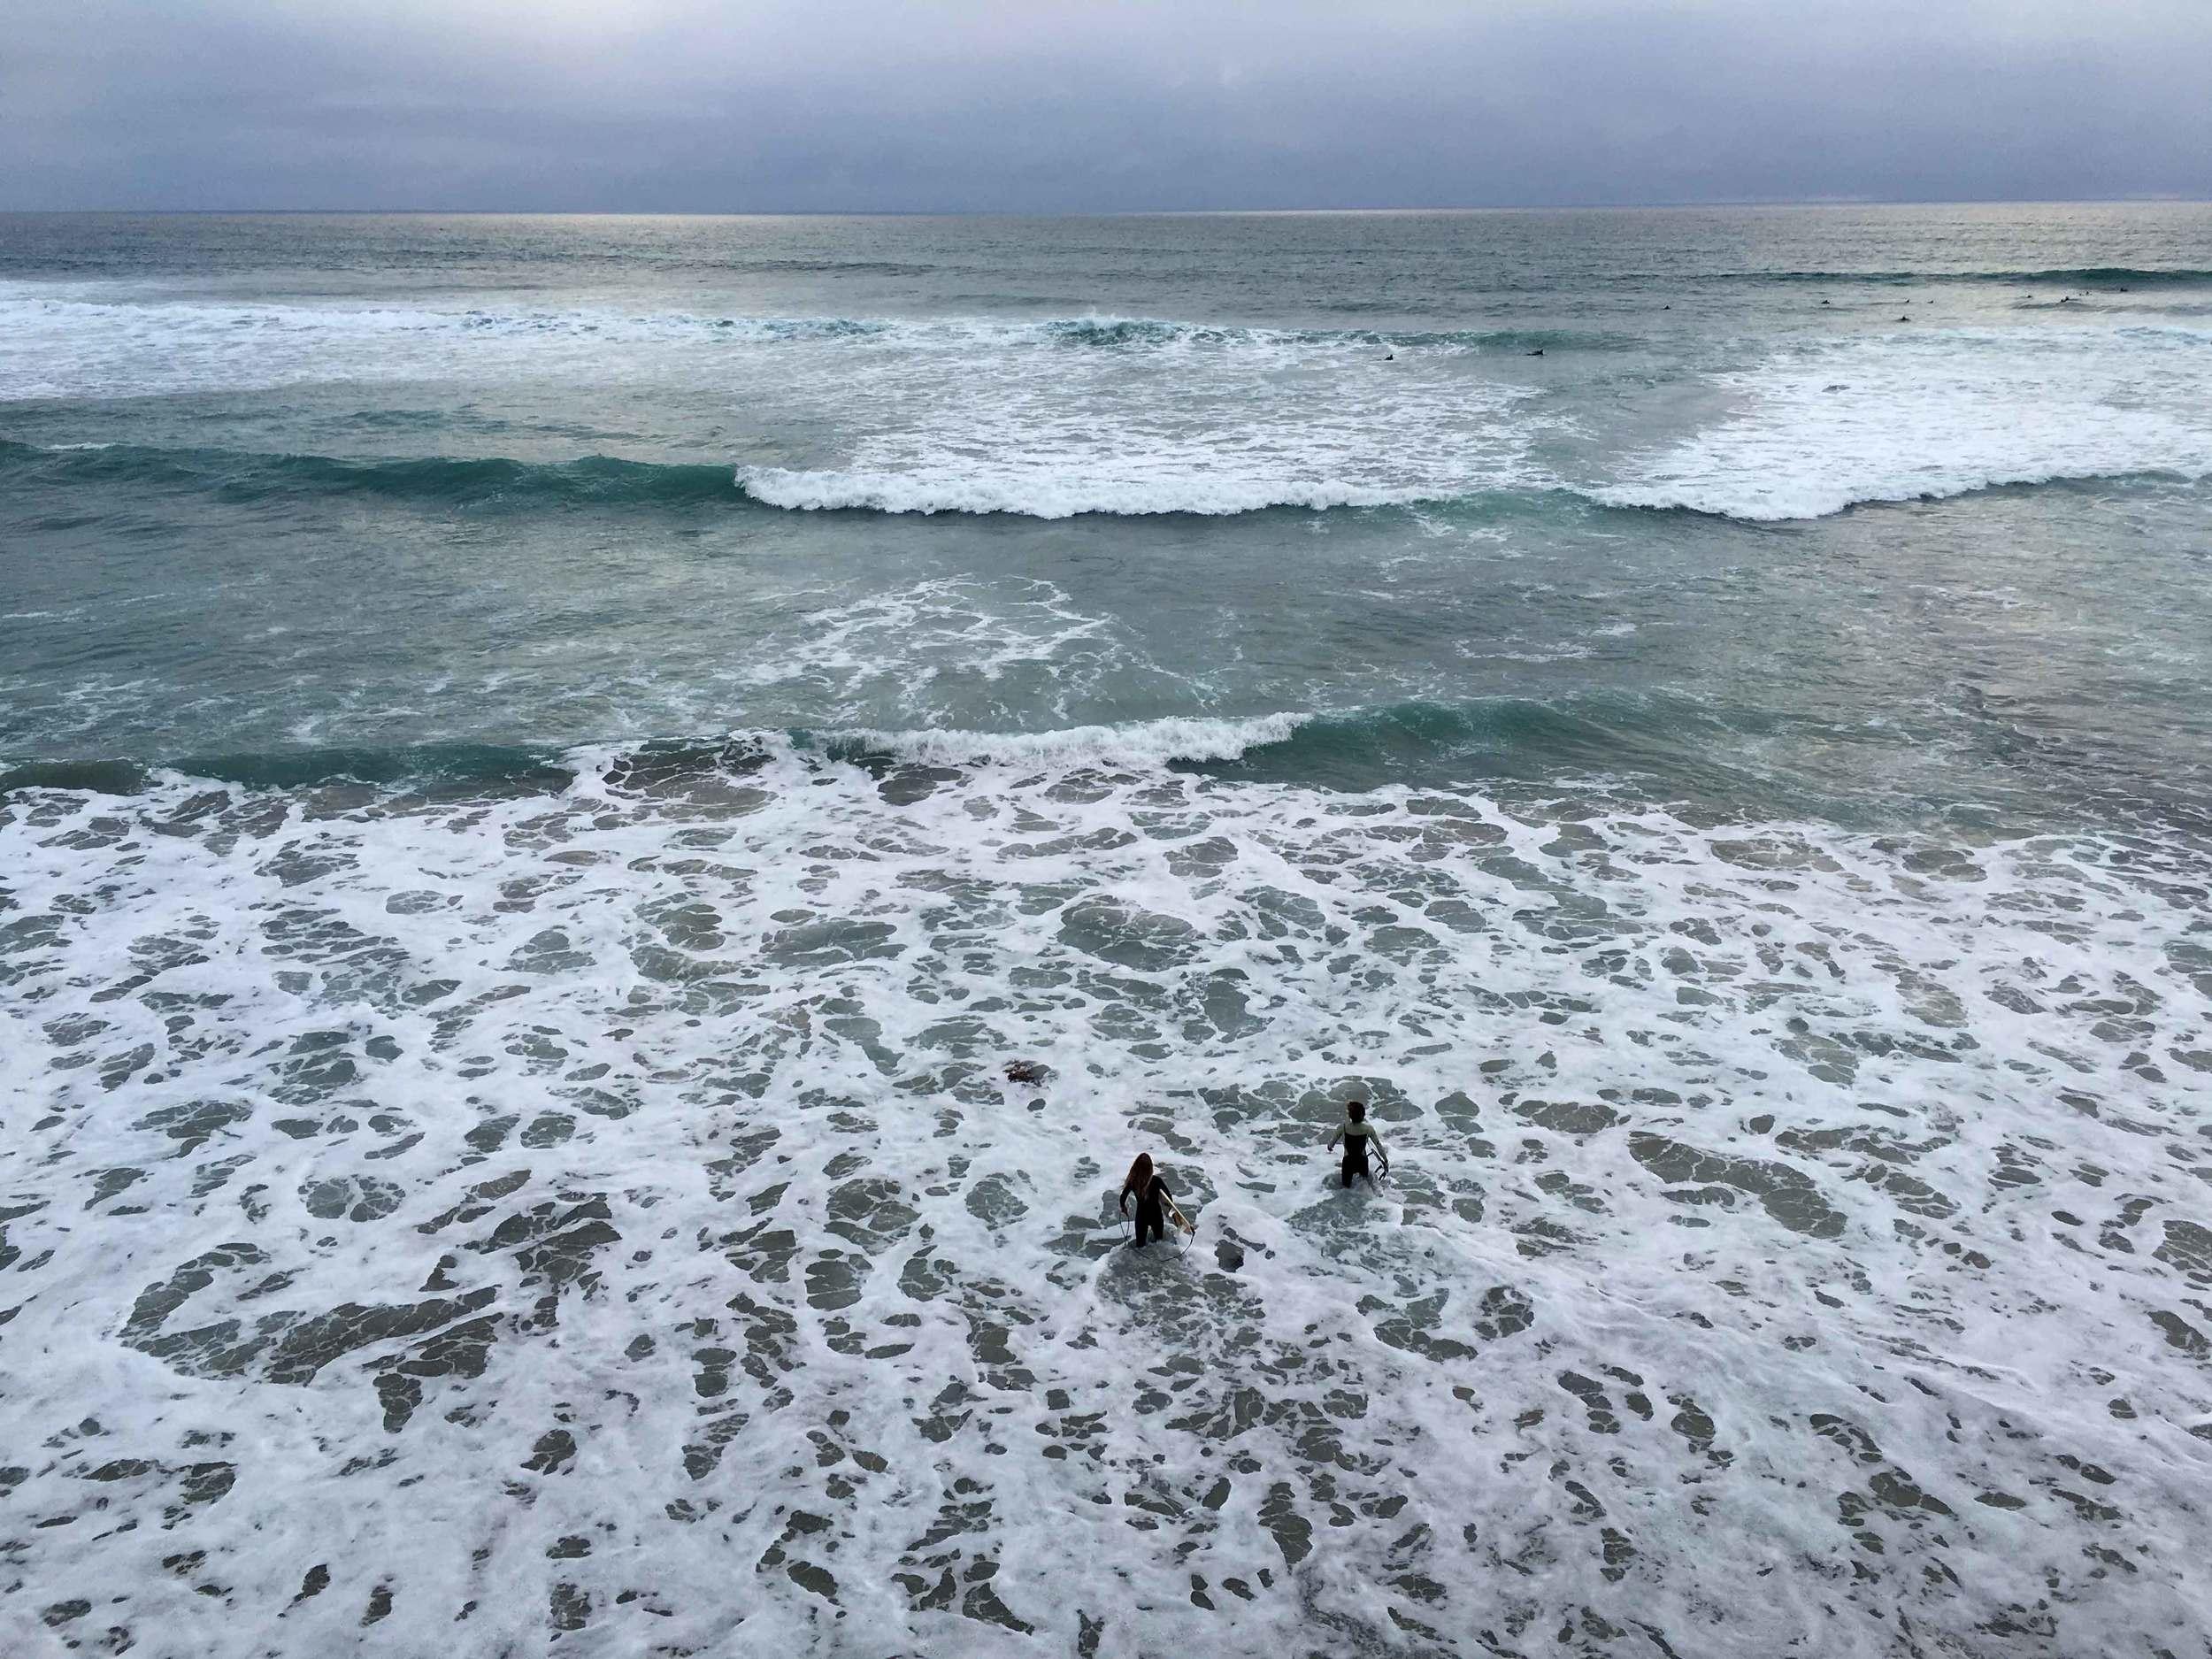 Surfers walking into the ocean, storm at the ocean, ocean view, Swamis beach, Encinitas, California. Image©sourcingstyle.com